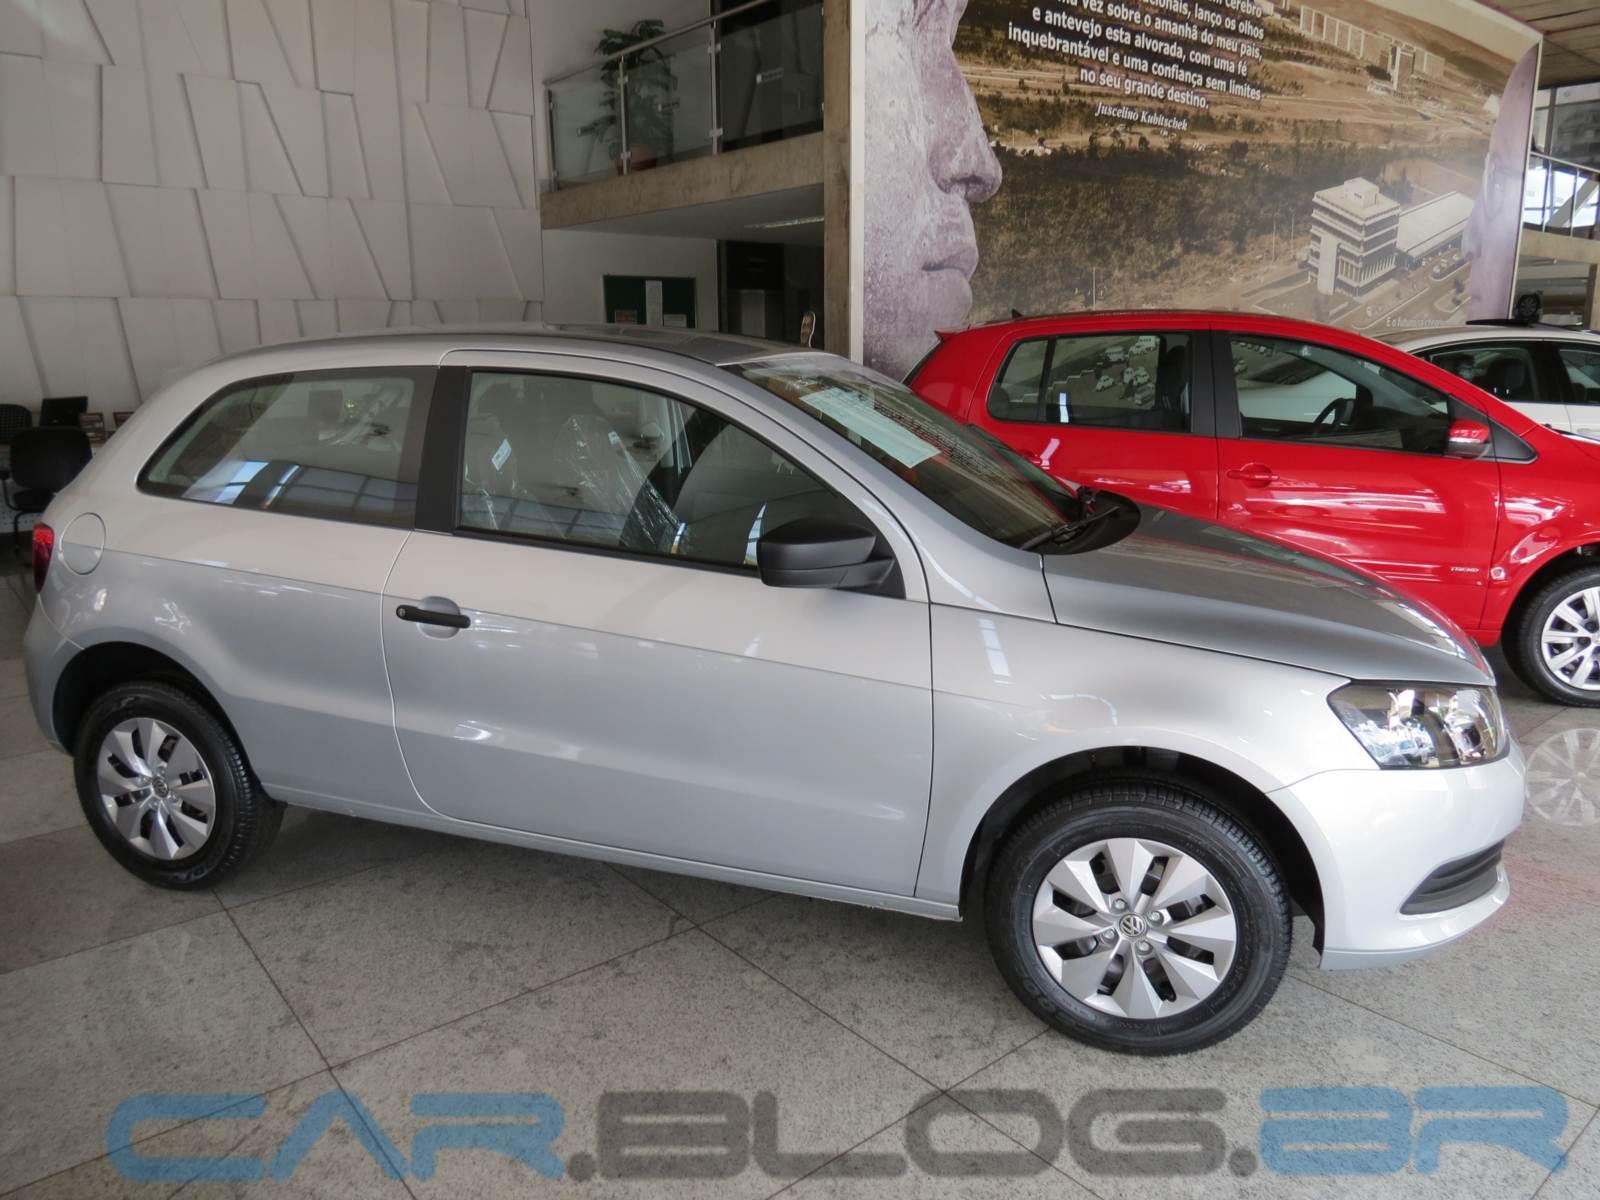 VW Gol G6 2 portas - Prata Sírius